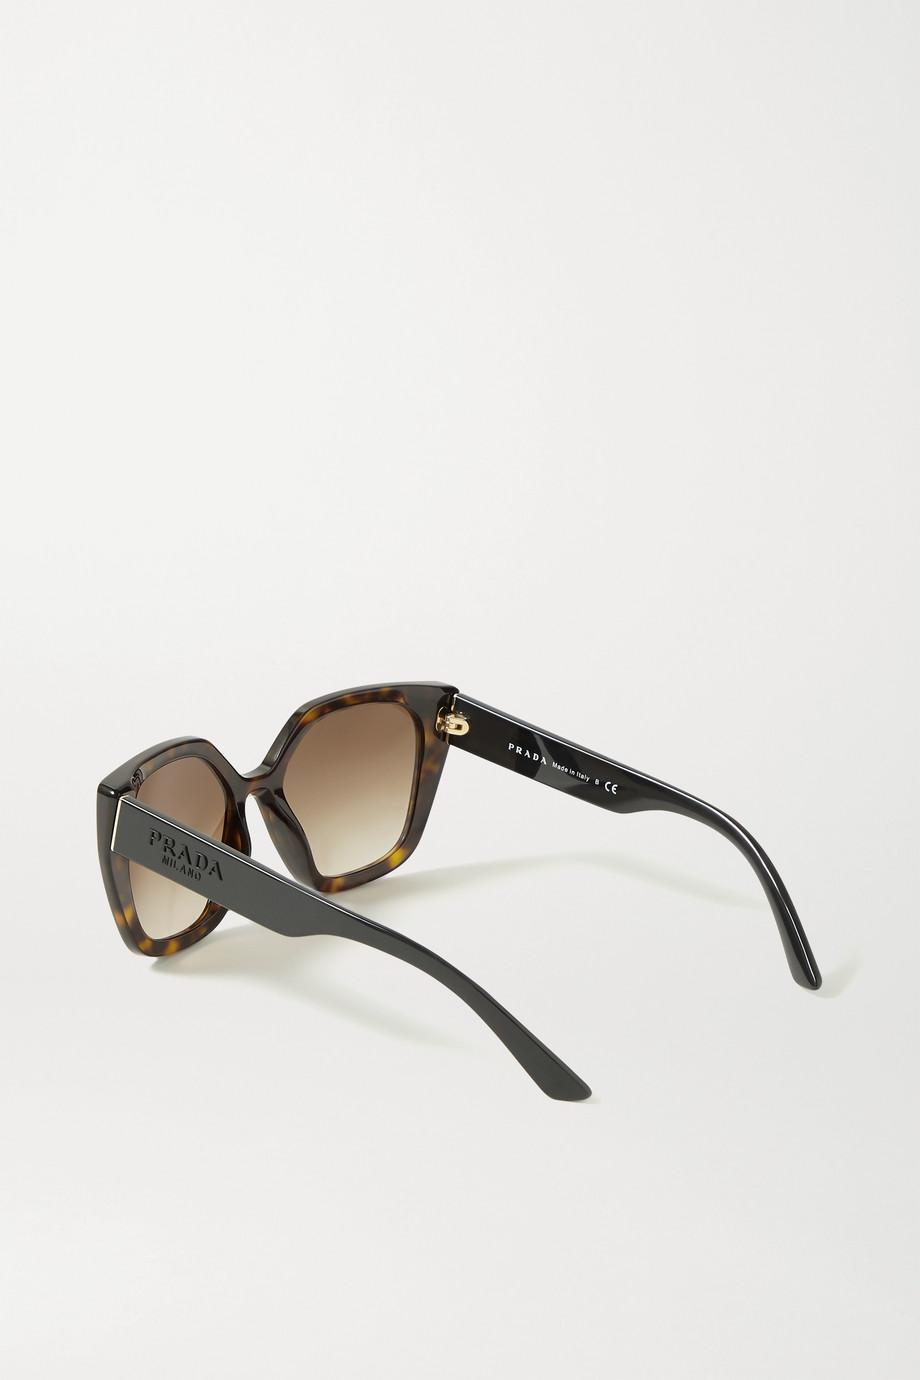 Prada Eyewear Square-frame tortoiseshell acetate sunglasses